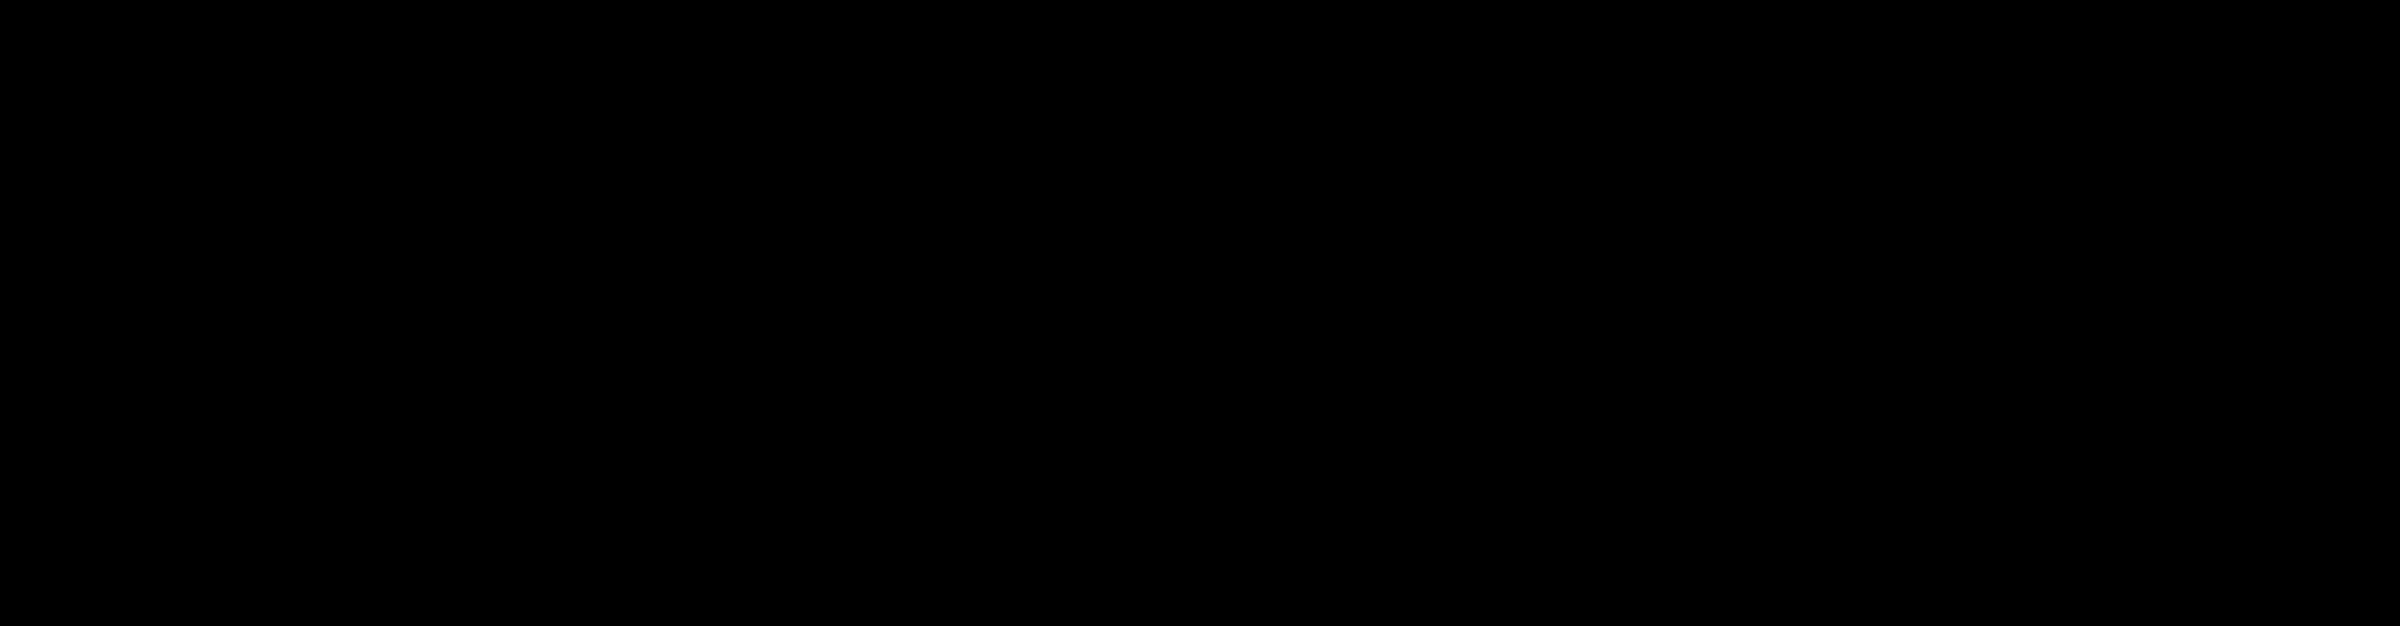 HUGO BOSS Logo PNG Transparent & SVG Vector.